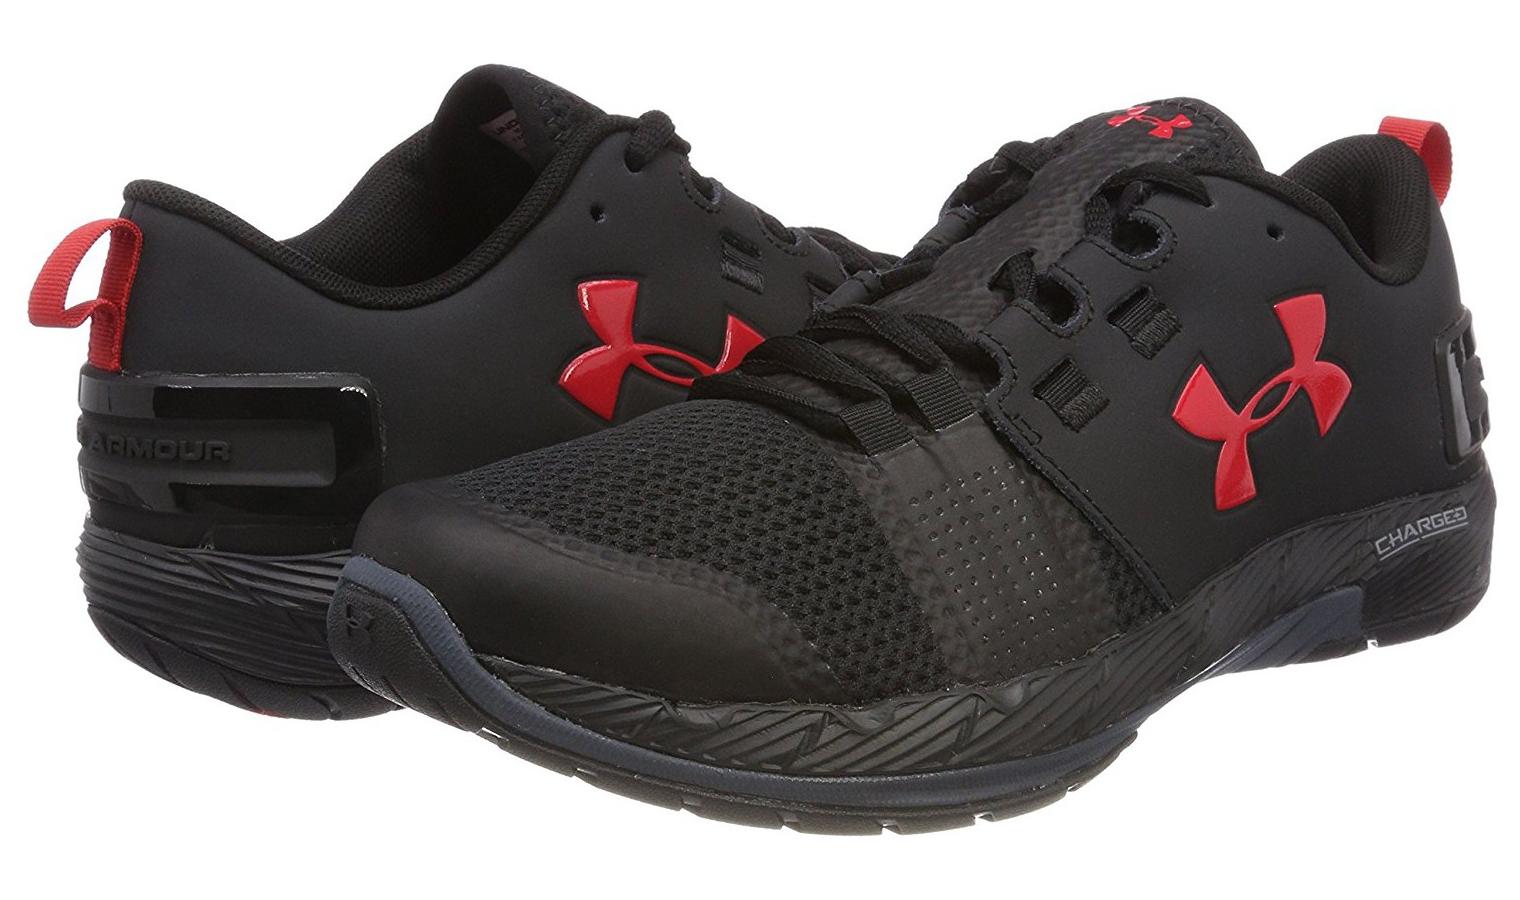 11e45074f77d Pánske tréningové topánky Under Armour UA COMMIT TR čierne